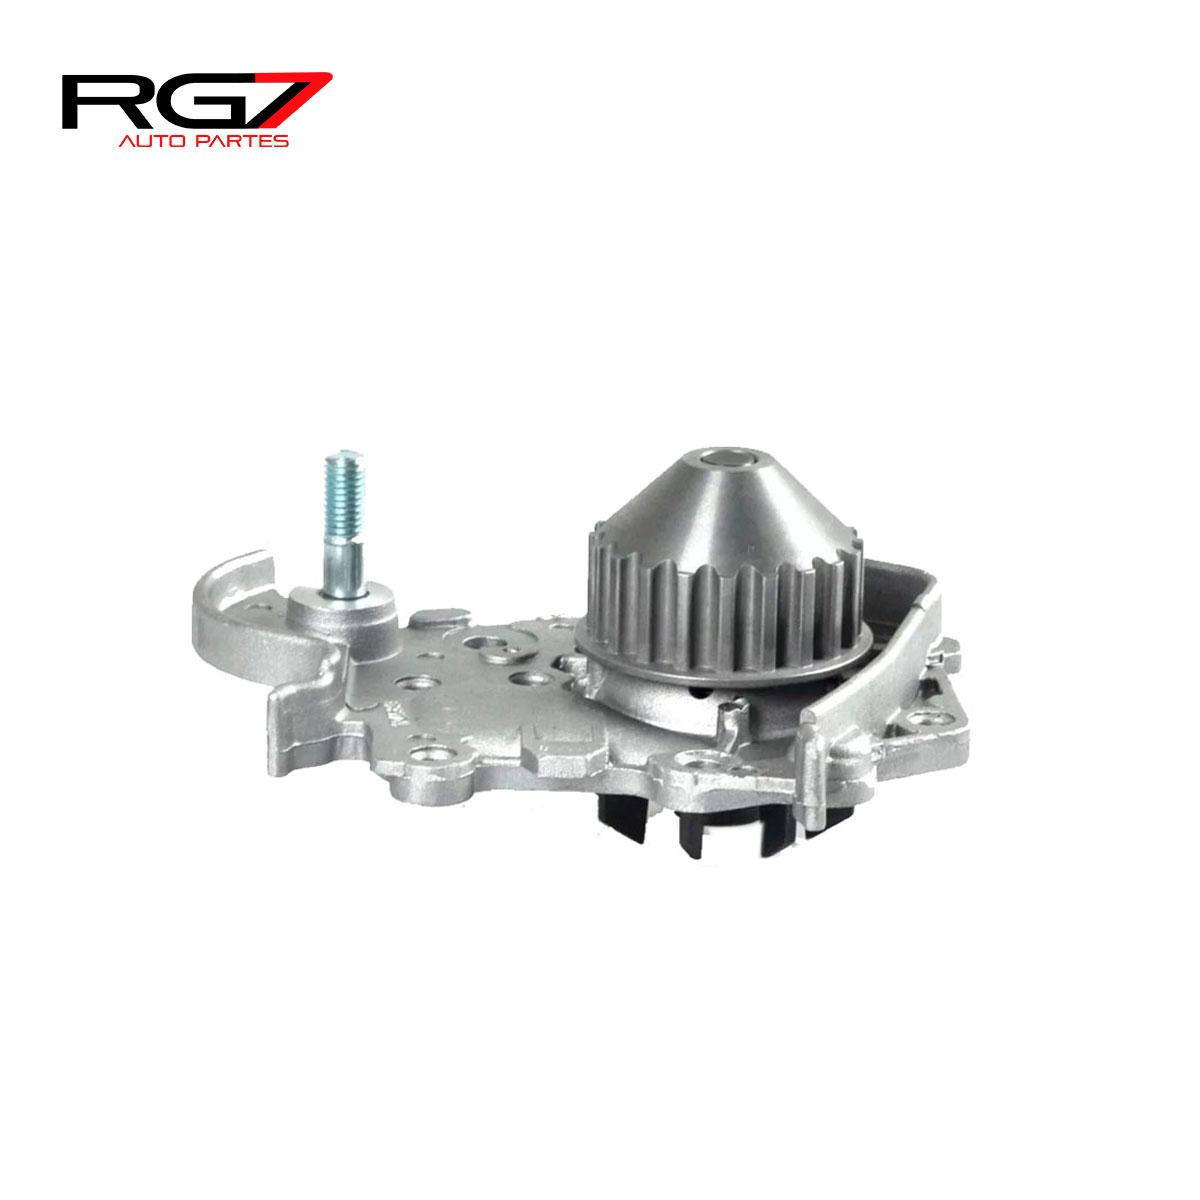 Bomba De Agua Renault Logan Simbol 8v